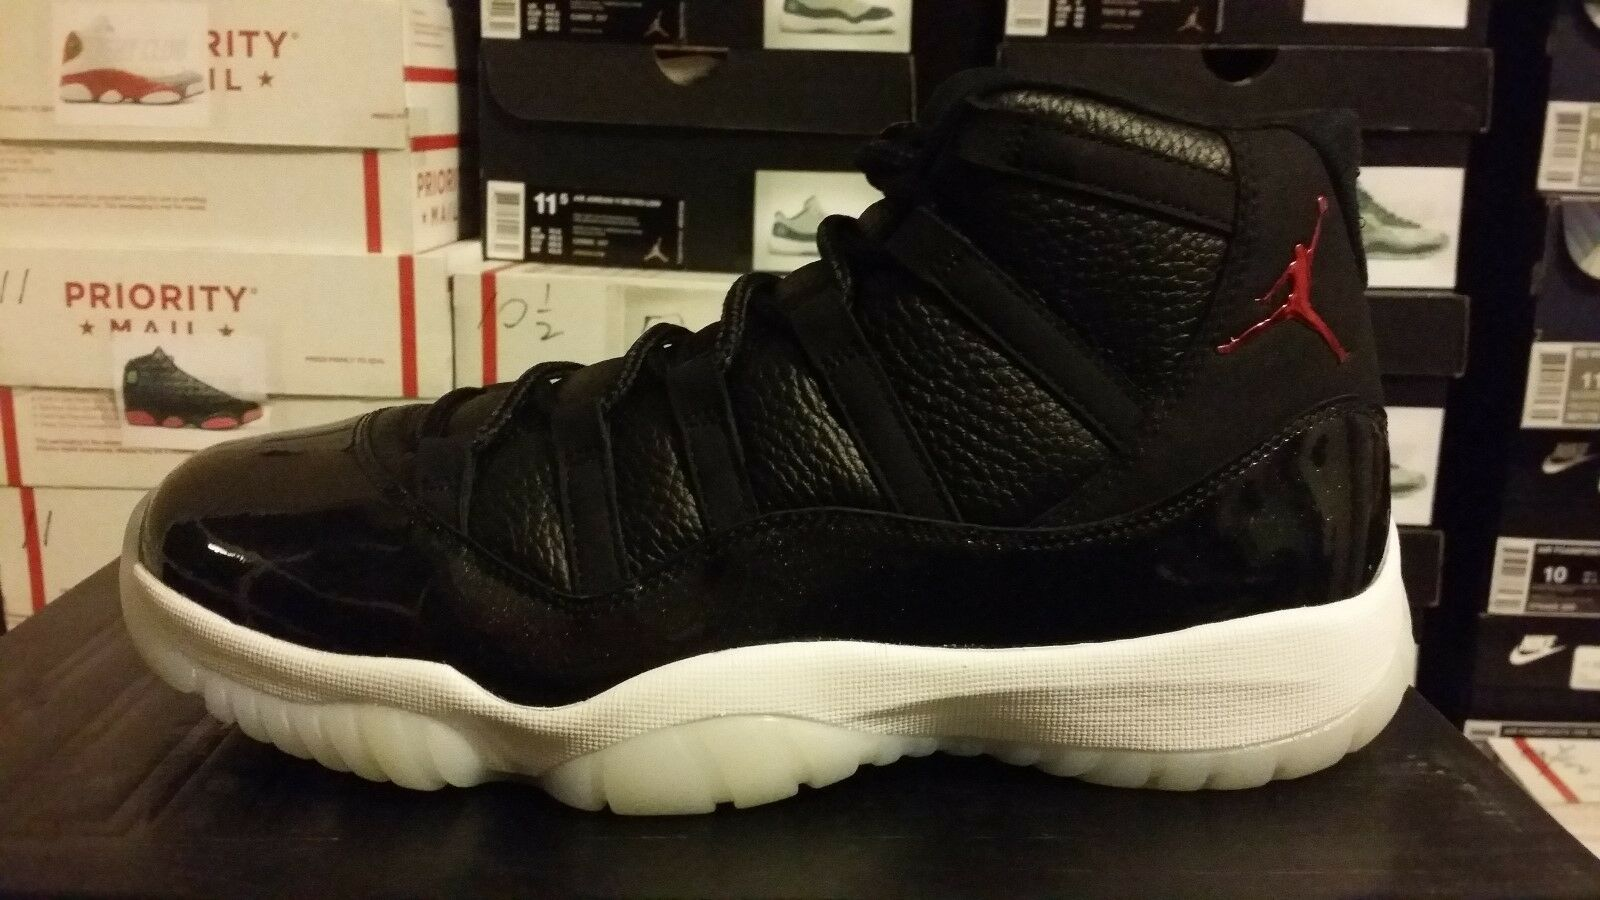 Nike Air Jordan 11 Retro men size